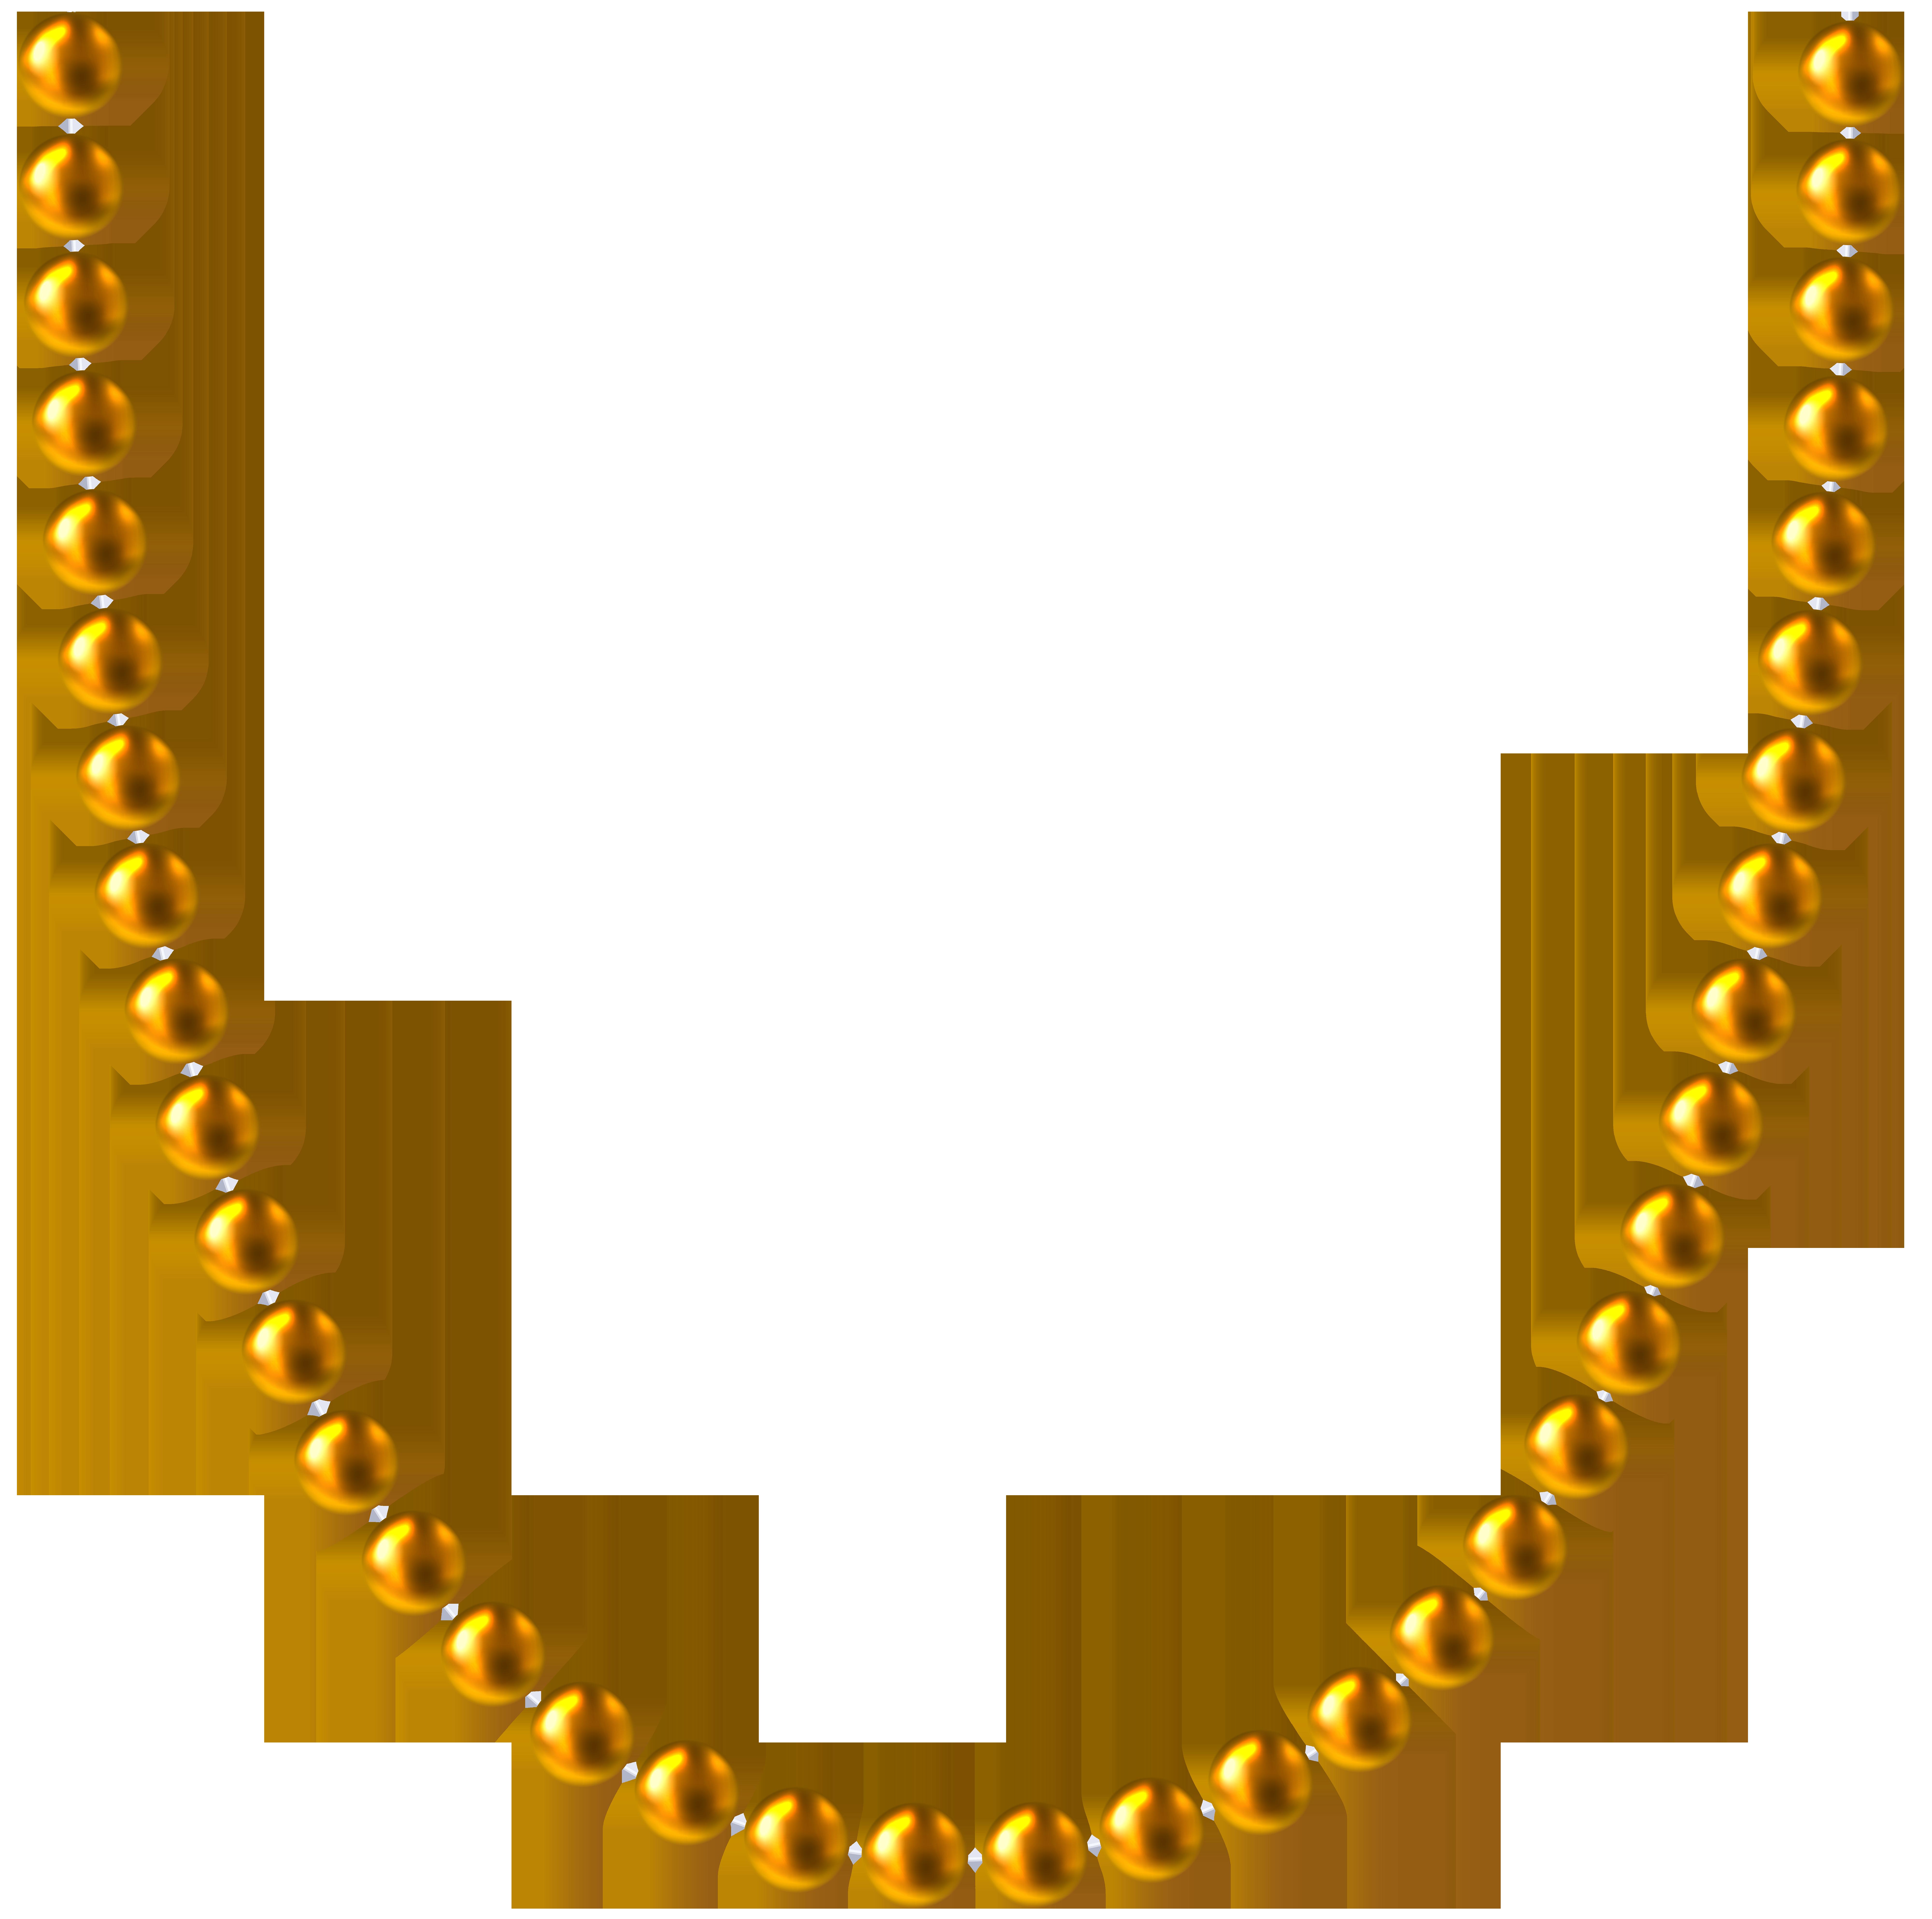 8000x7947 Gold Beads Png Clip Art Imageu200b Gallery Yopriceville